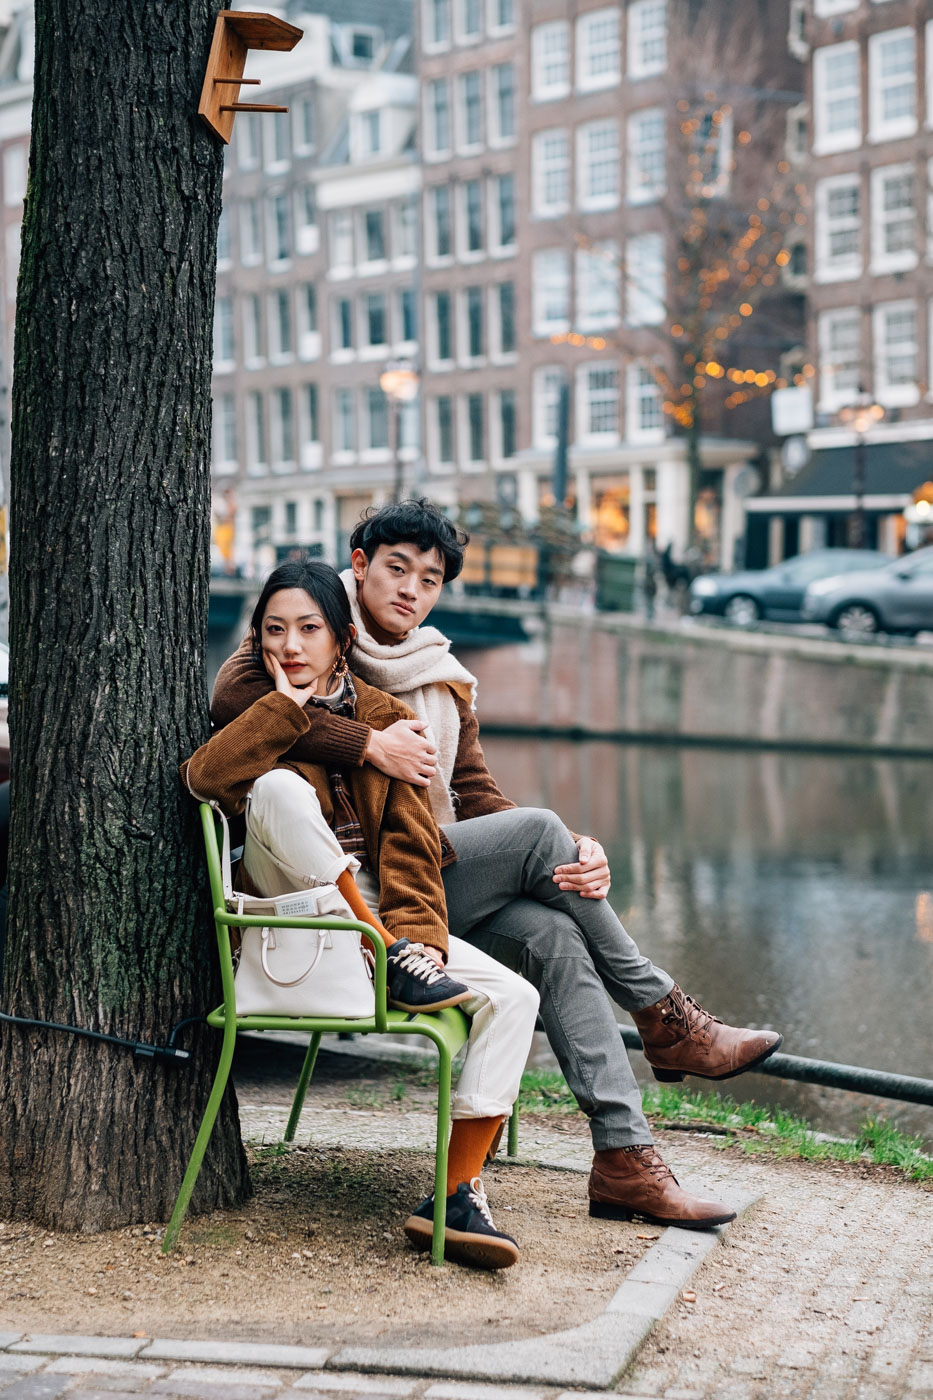 photowalking tour experience amsterdam